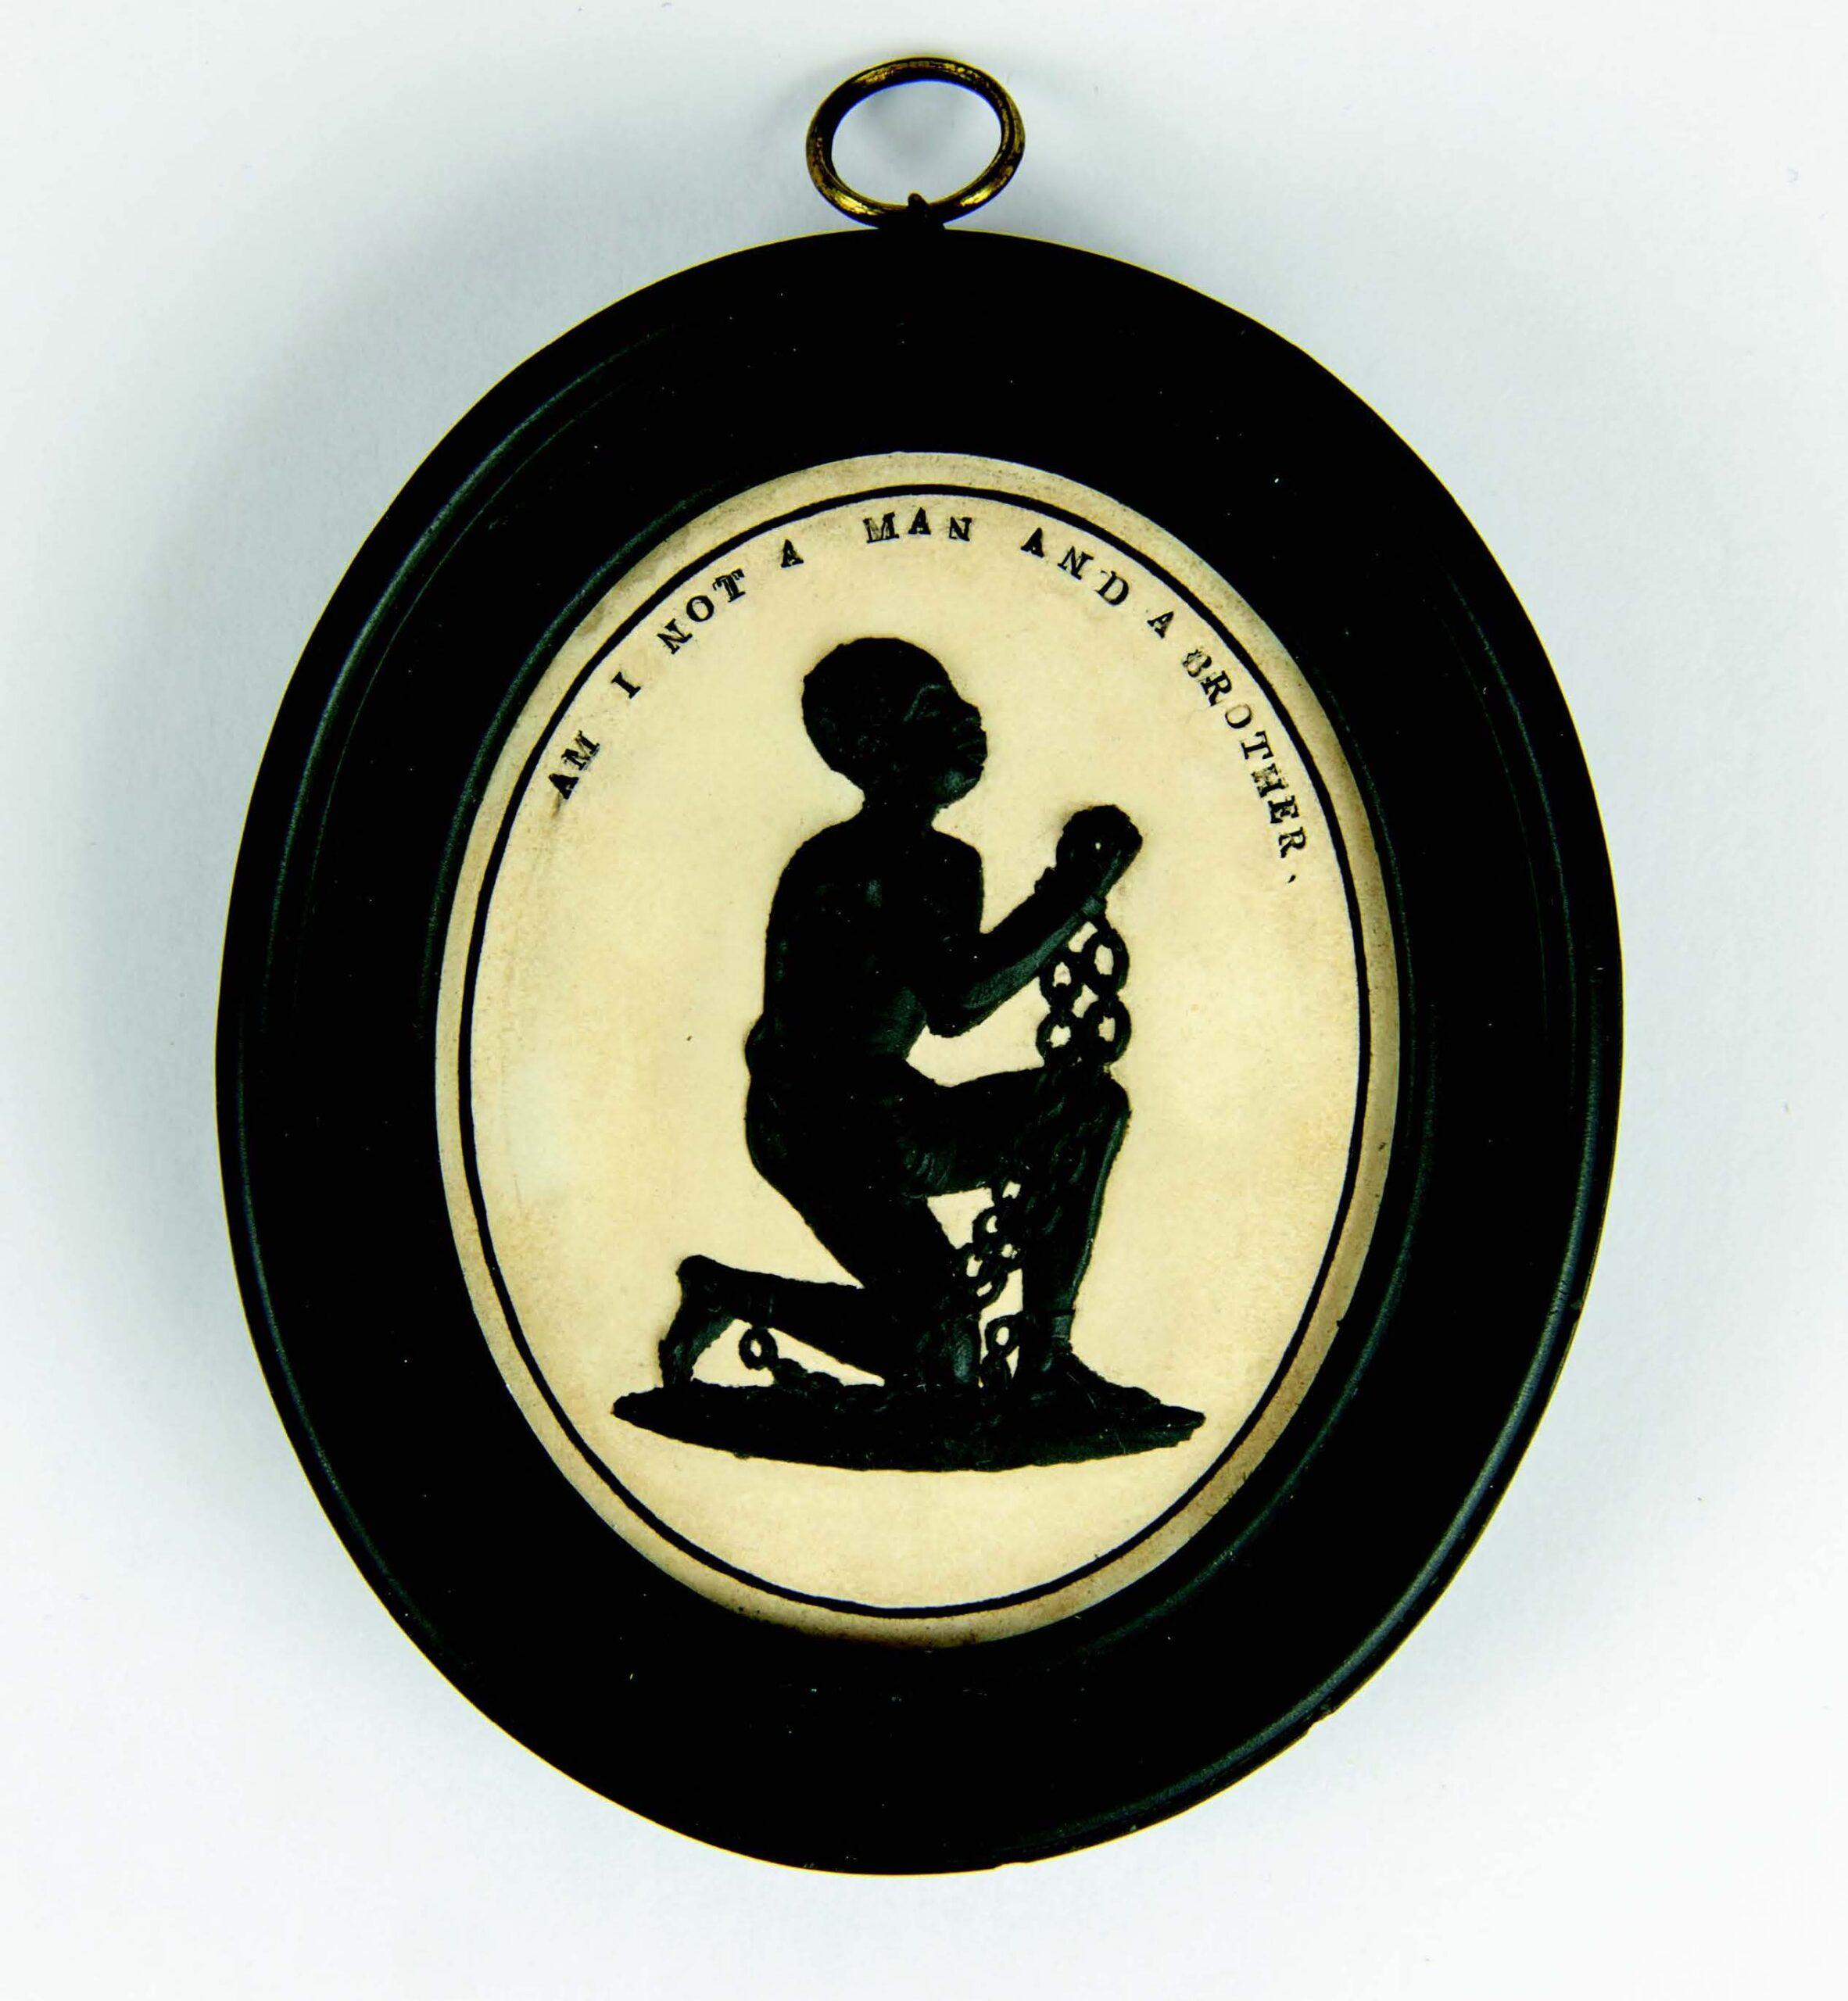 Josiah Wedgwood abolitionist medallion